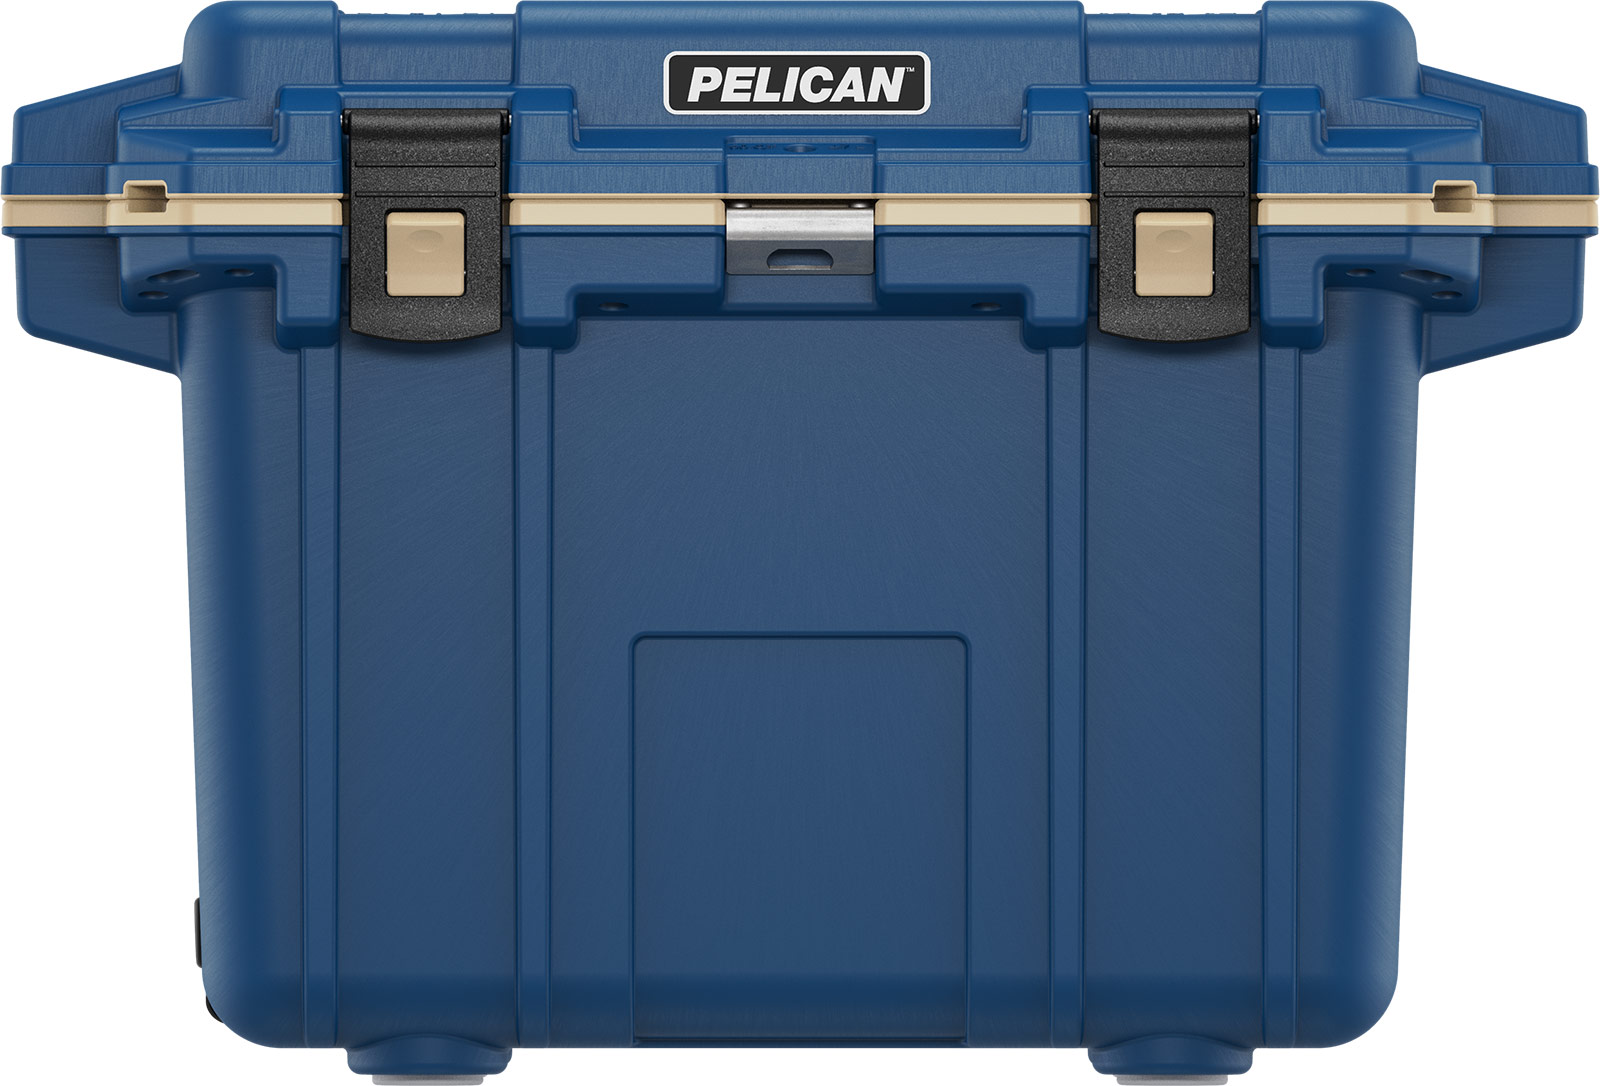 pelican blue overland coolers 50 quart cooler